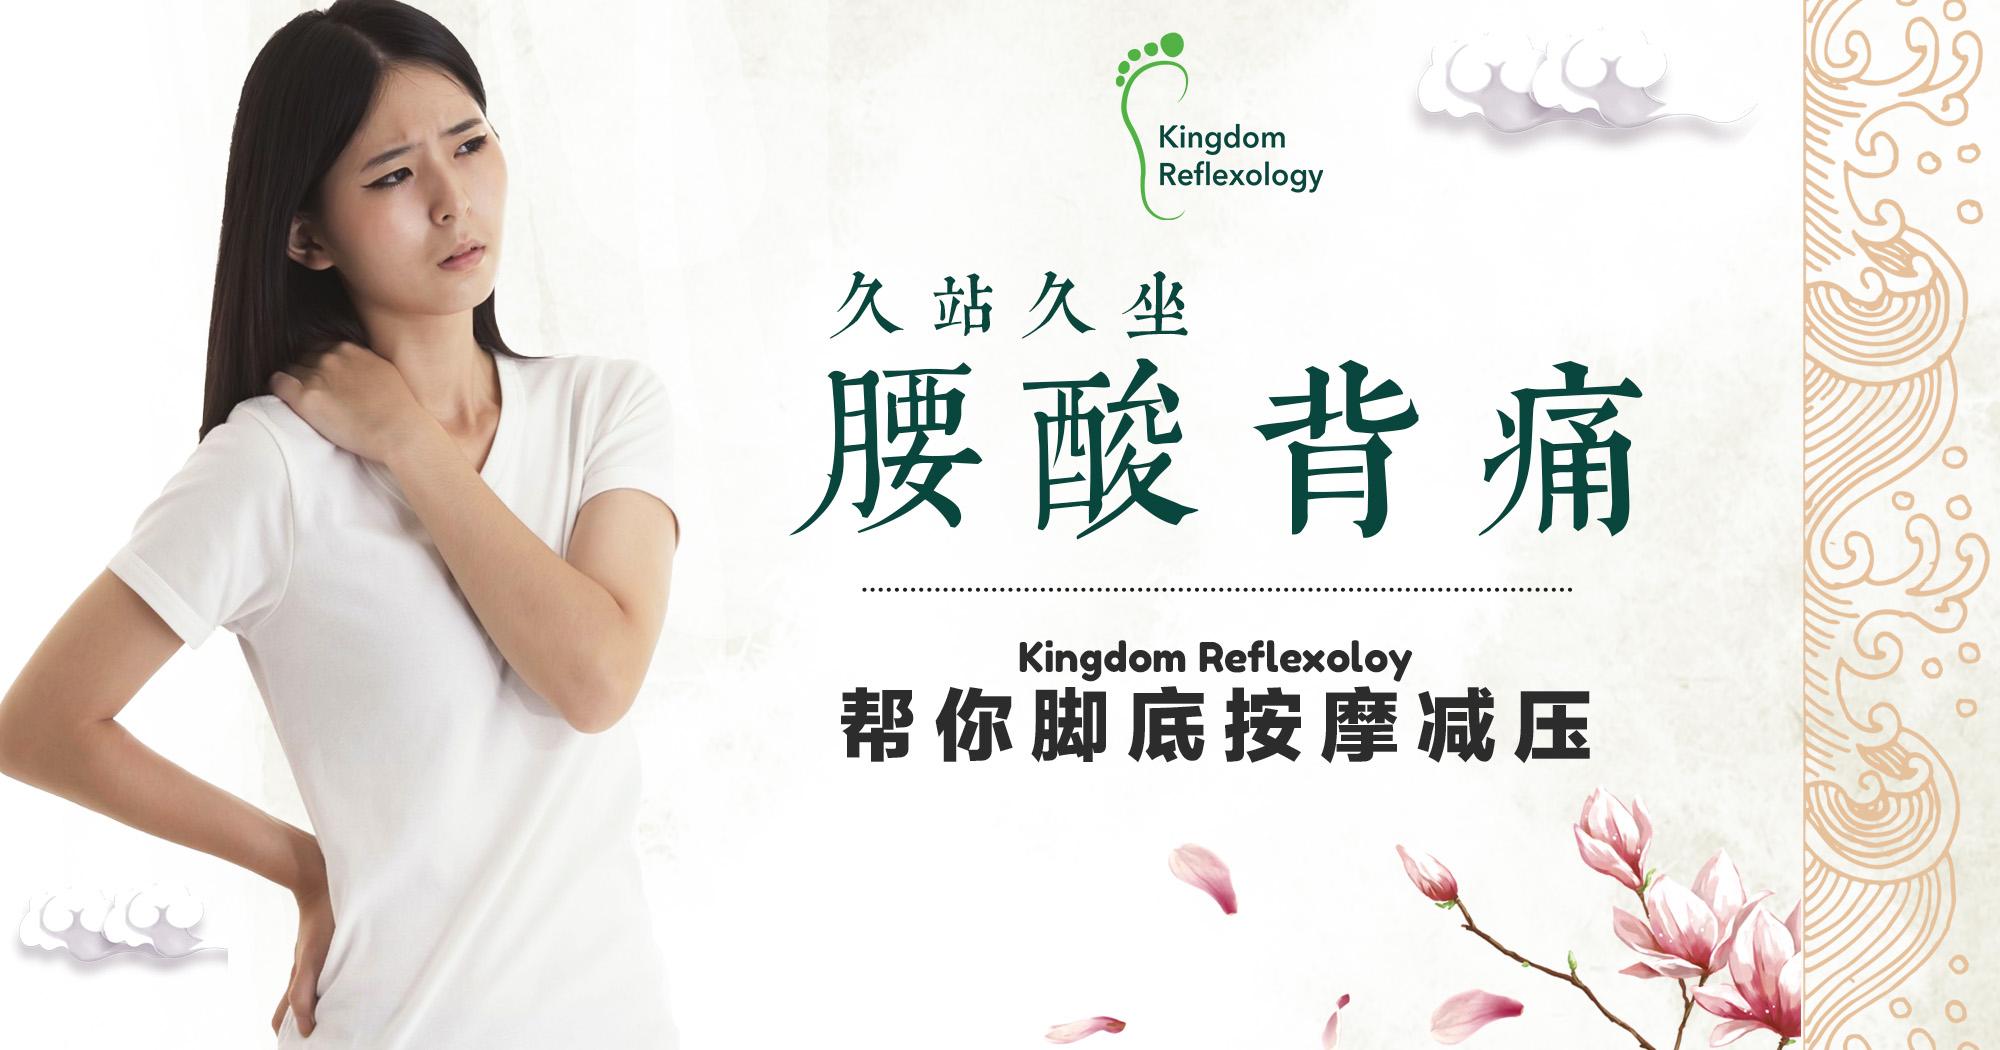 Kingdom-Reflexology-Foot Massage